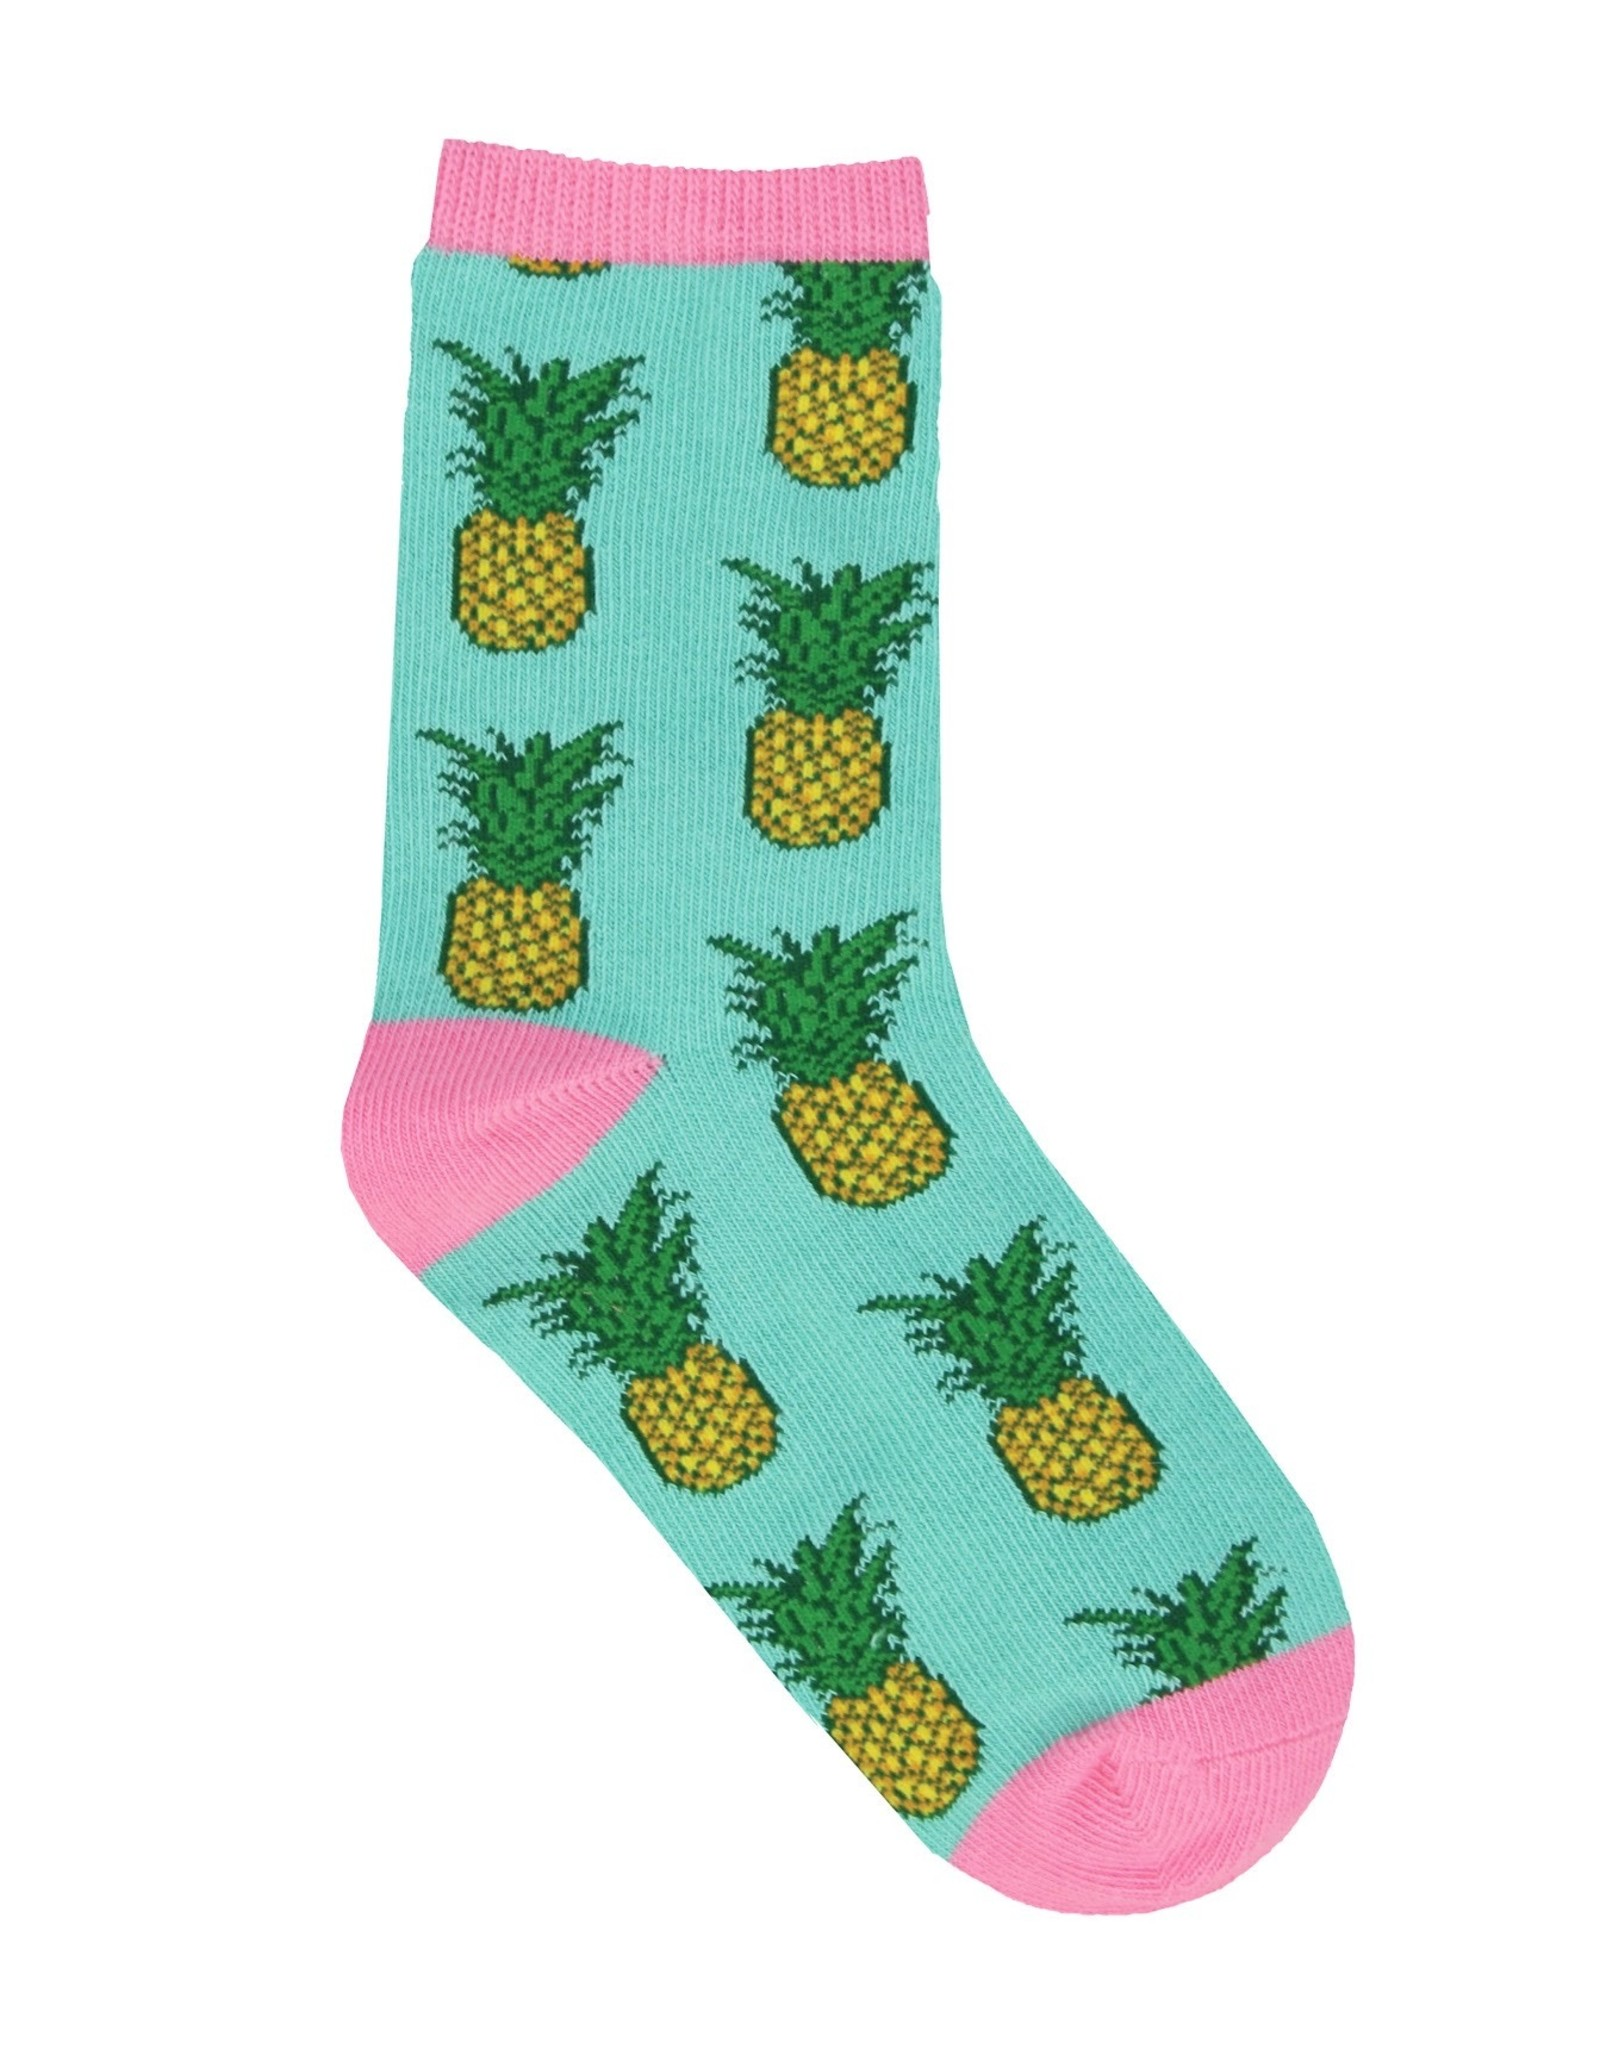 Sock Smith Pineapple socks